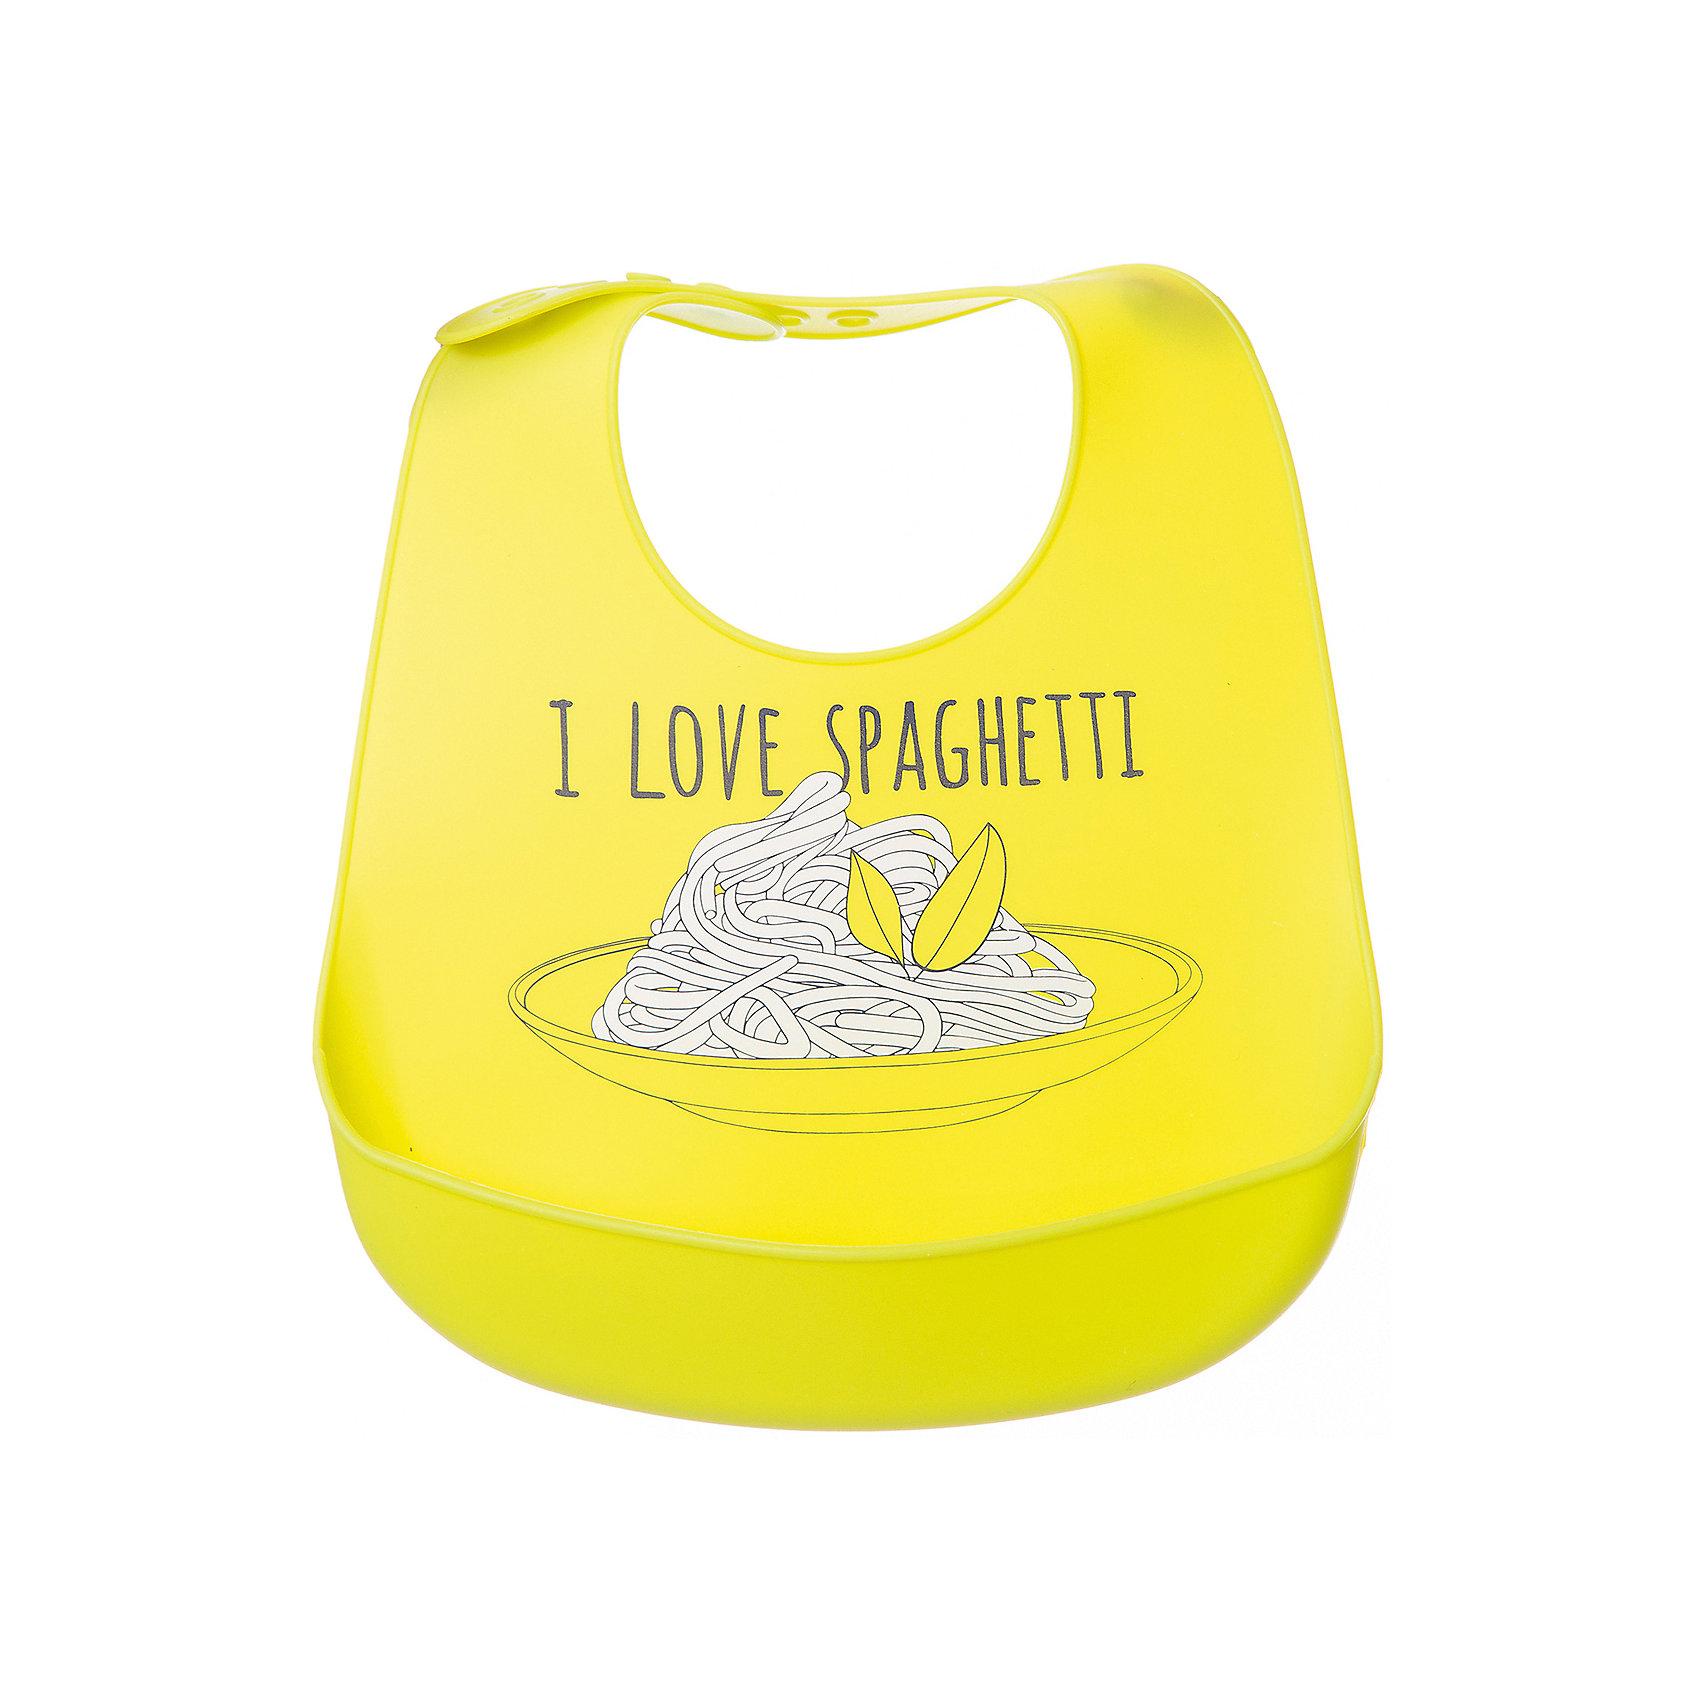 Happy Baby Нагрудник силиконовый мягкий Bib Pocket, Happy Baby, лайм нагрудник силиконовый happy baby bib pocket 16006 lime